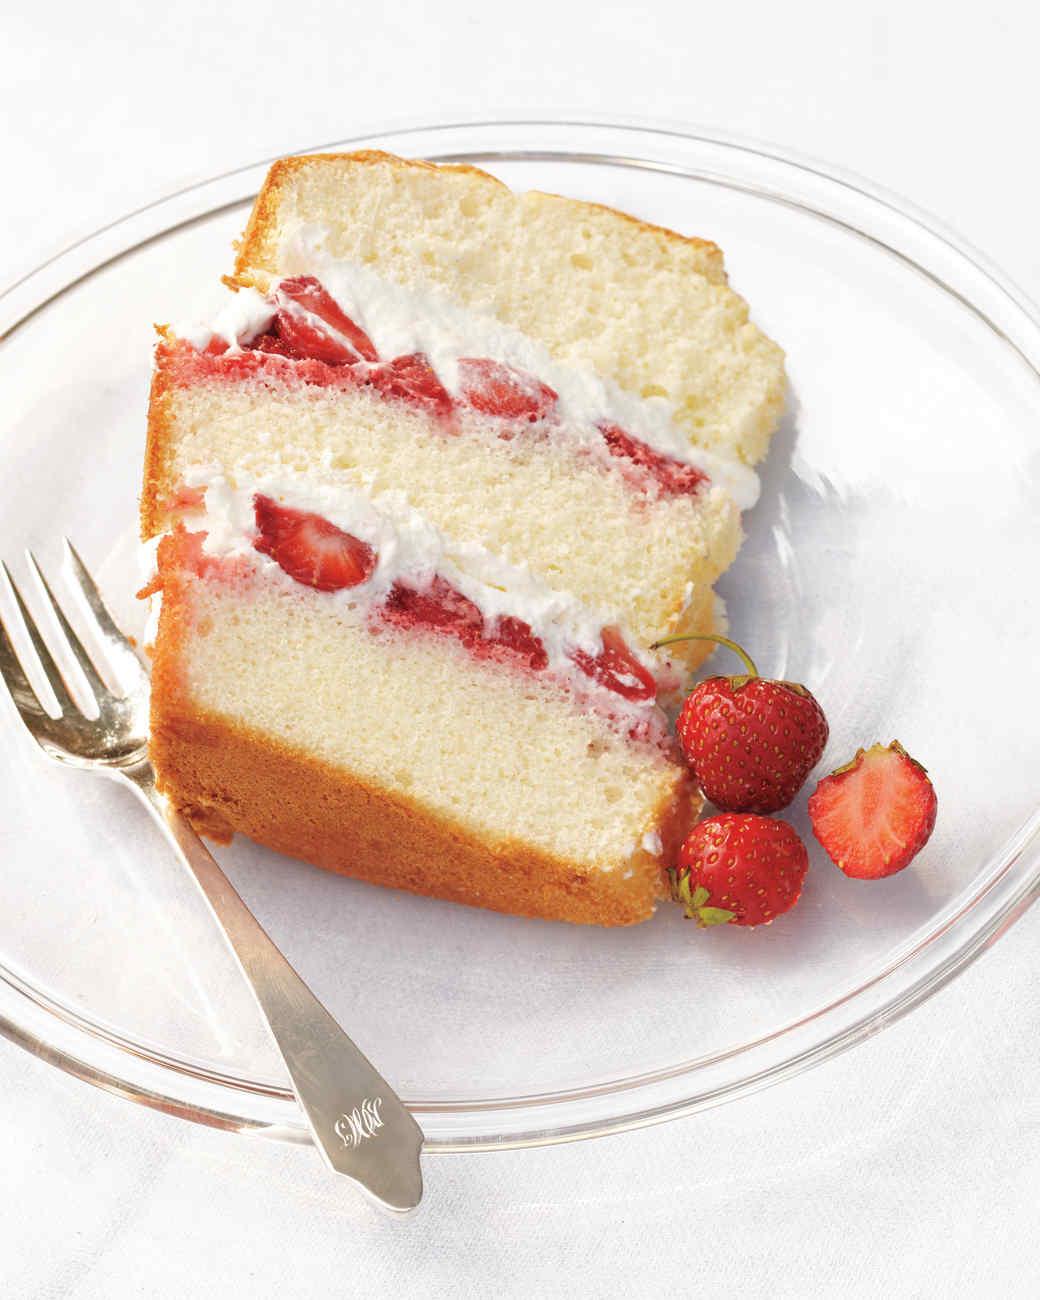 Martha stewart easy birthday cake recipes Best cook recipes online